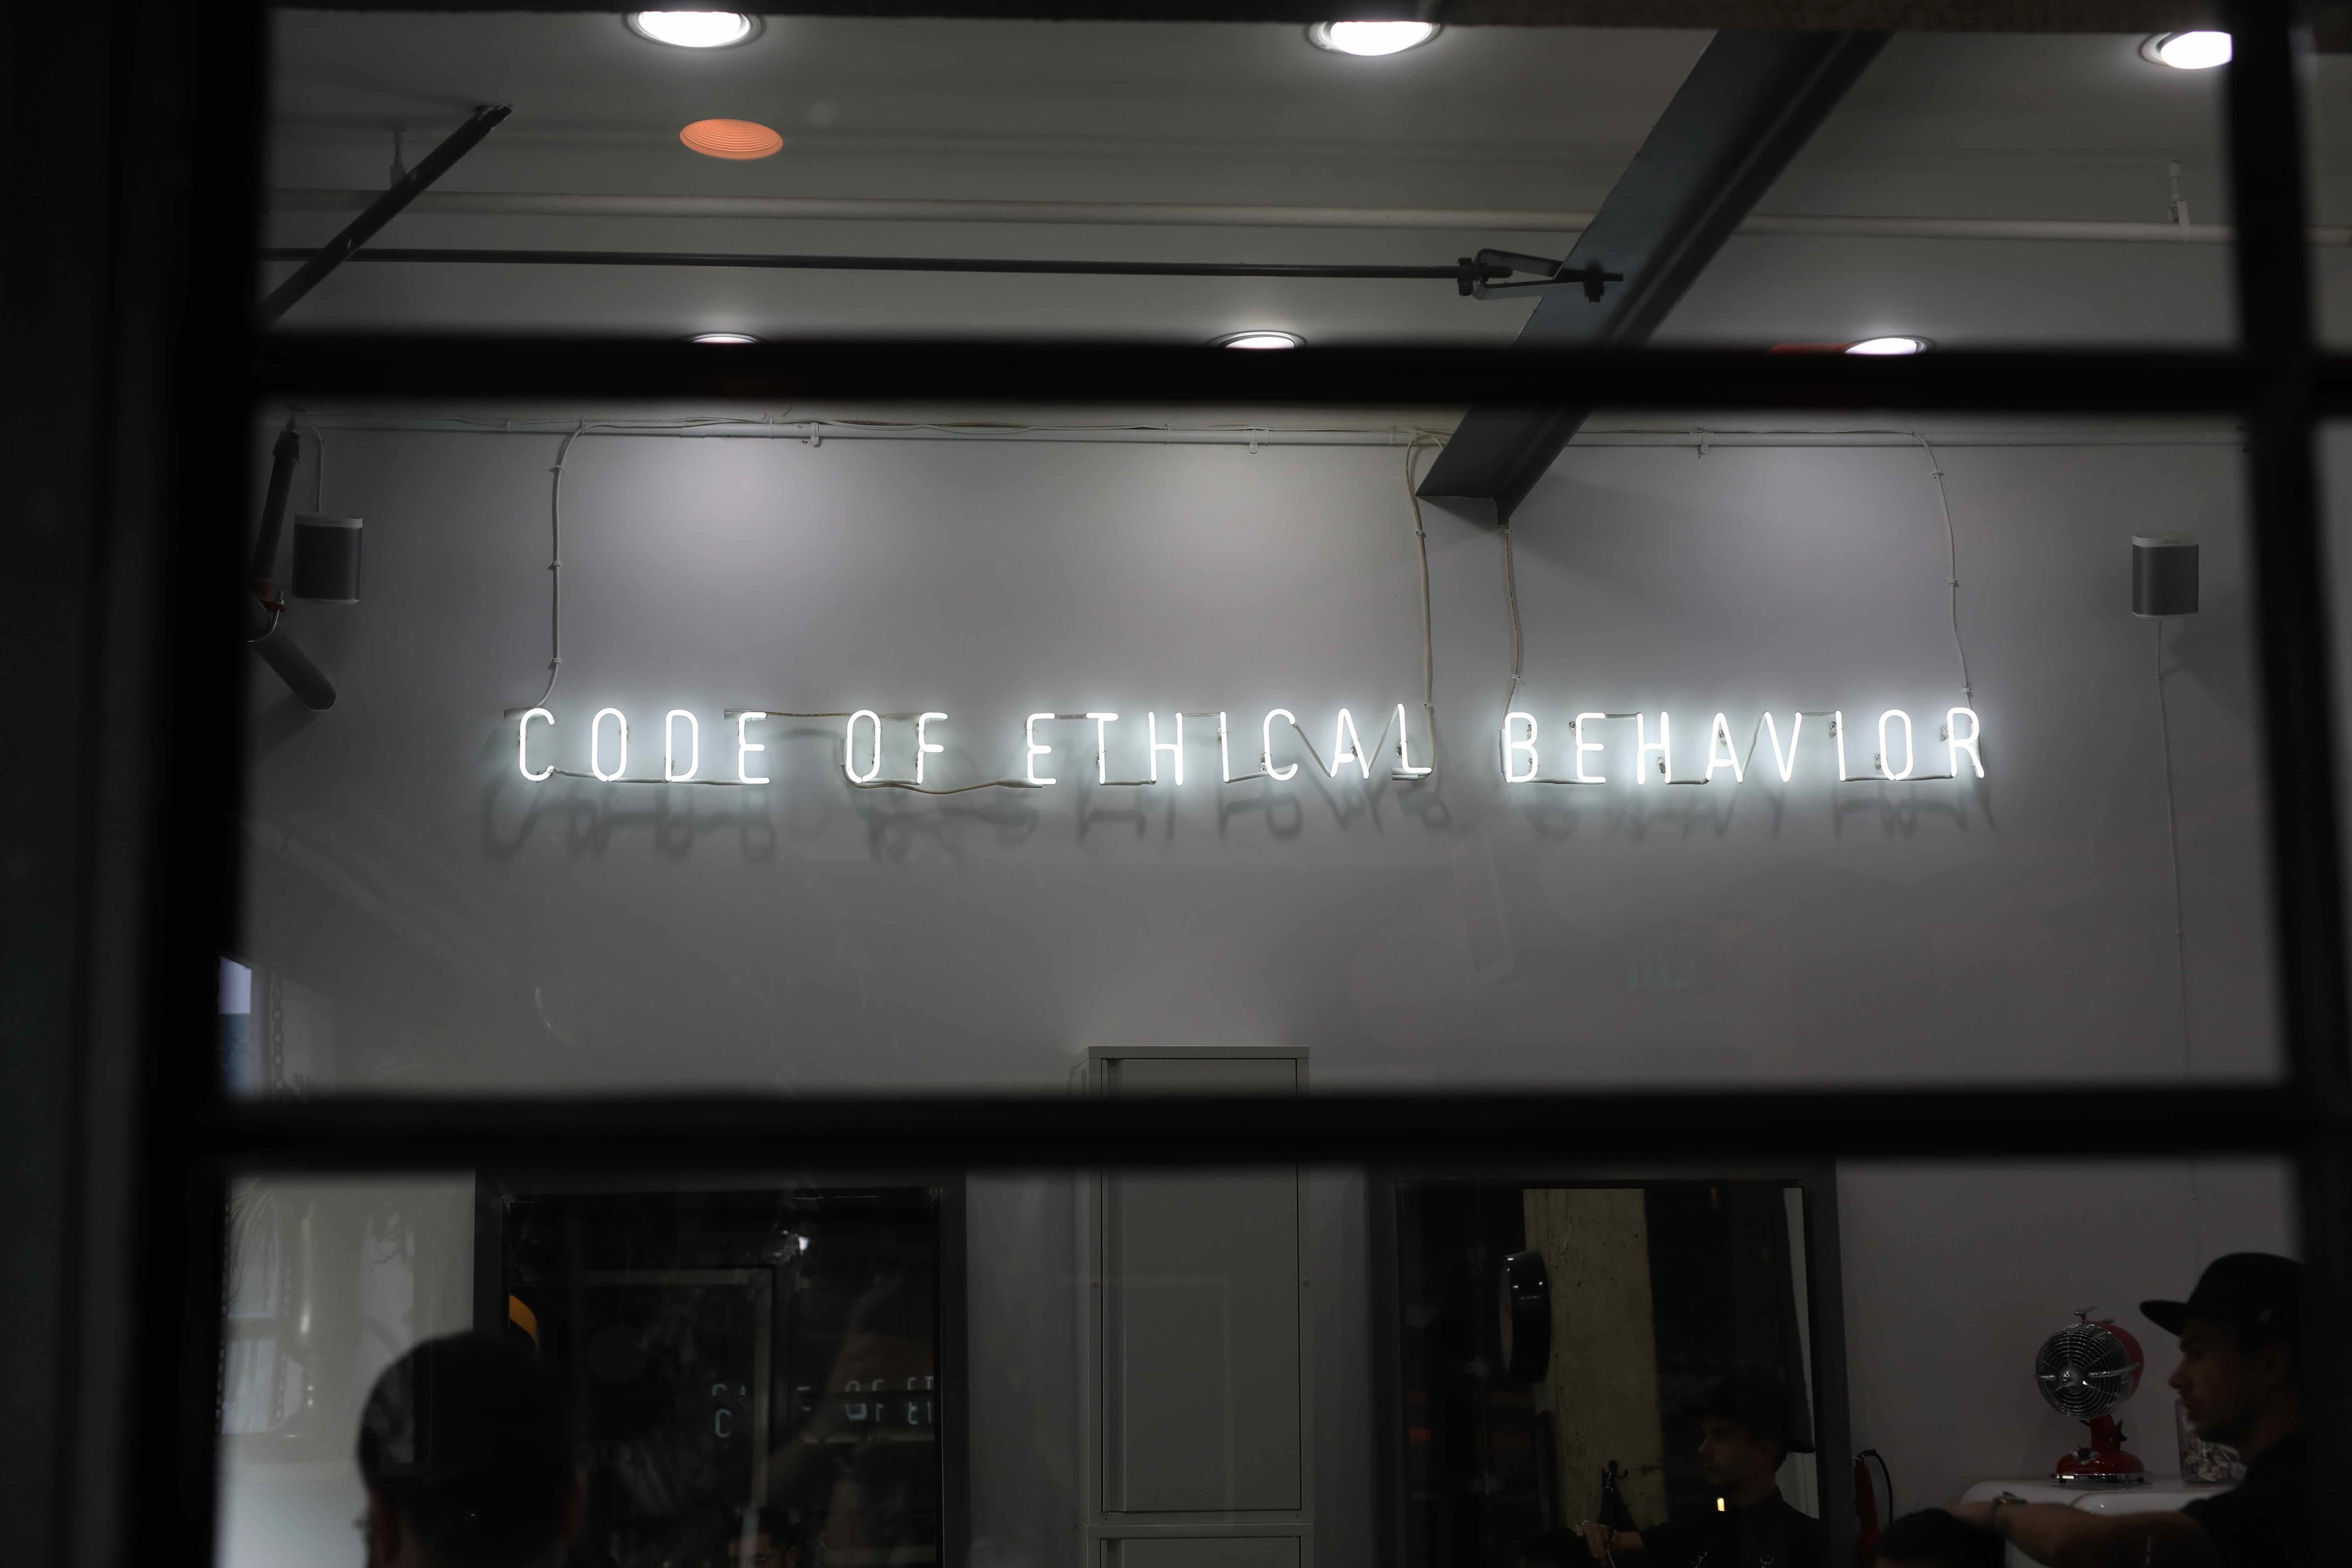 Code of Ethical Behavior shop front